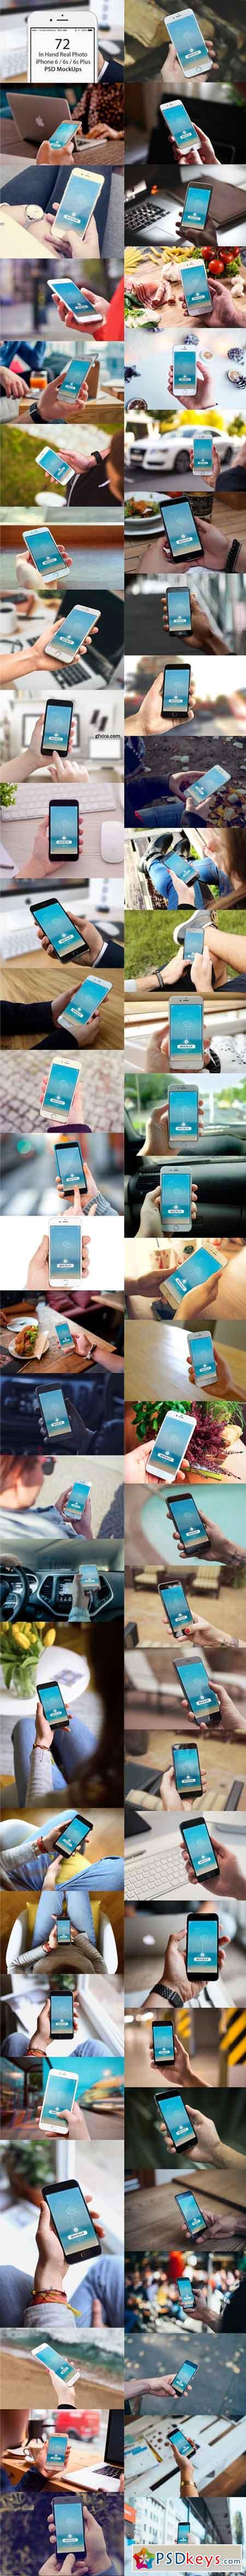 72 In Hand iPhone 6s Plus Mockups 830698